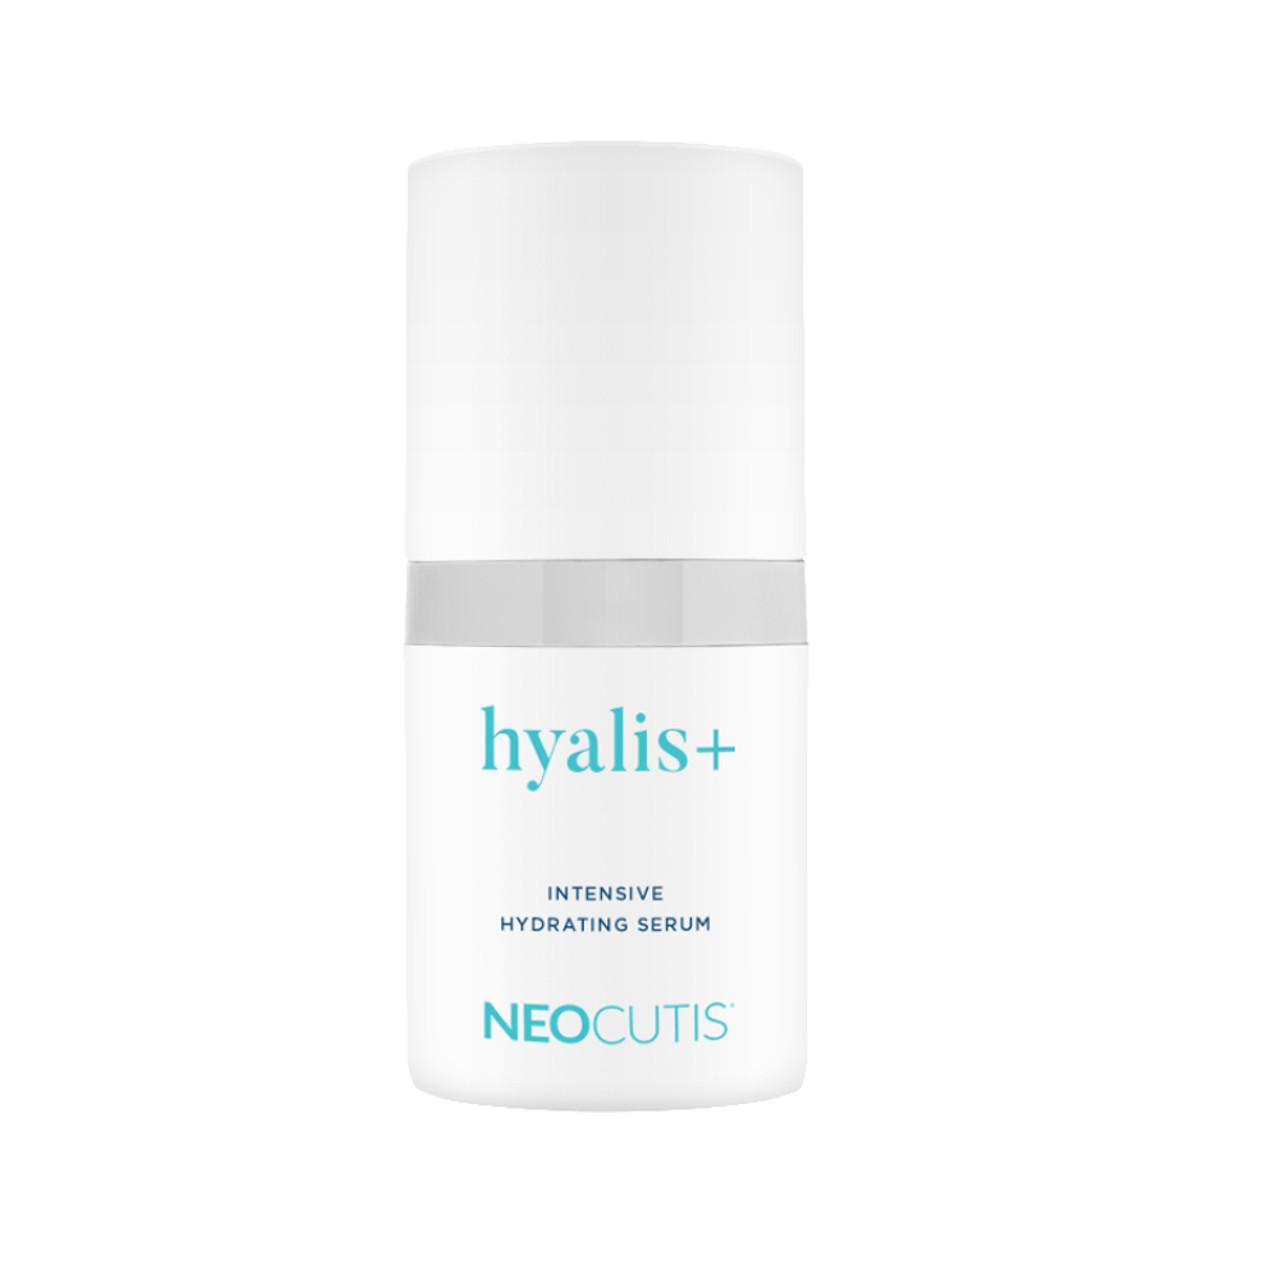 Neocutis HYALIS+ Intensive Hydrating Serum 30 mL